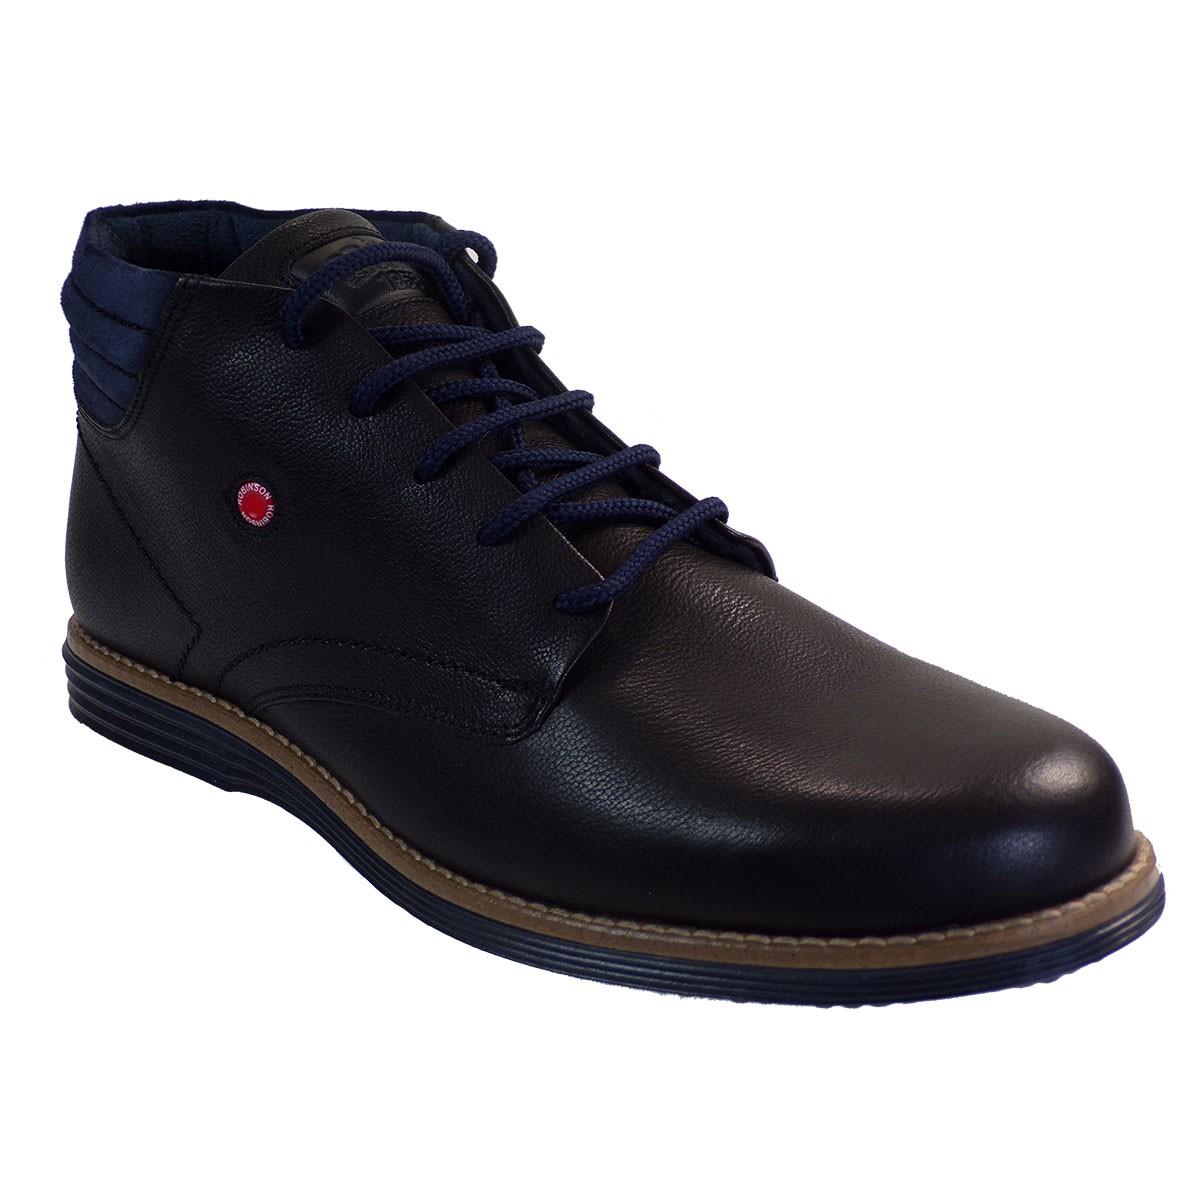 Robinson Ανδρικά Παπούτσια Μποτάκια 2091 Μαύρο Δέρμα